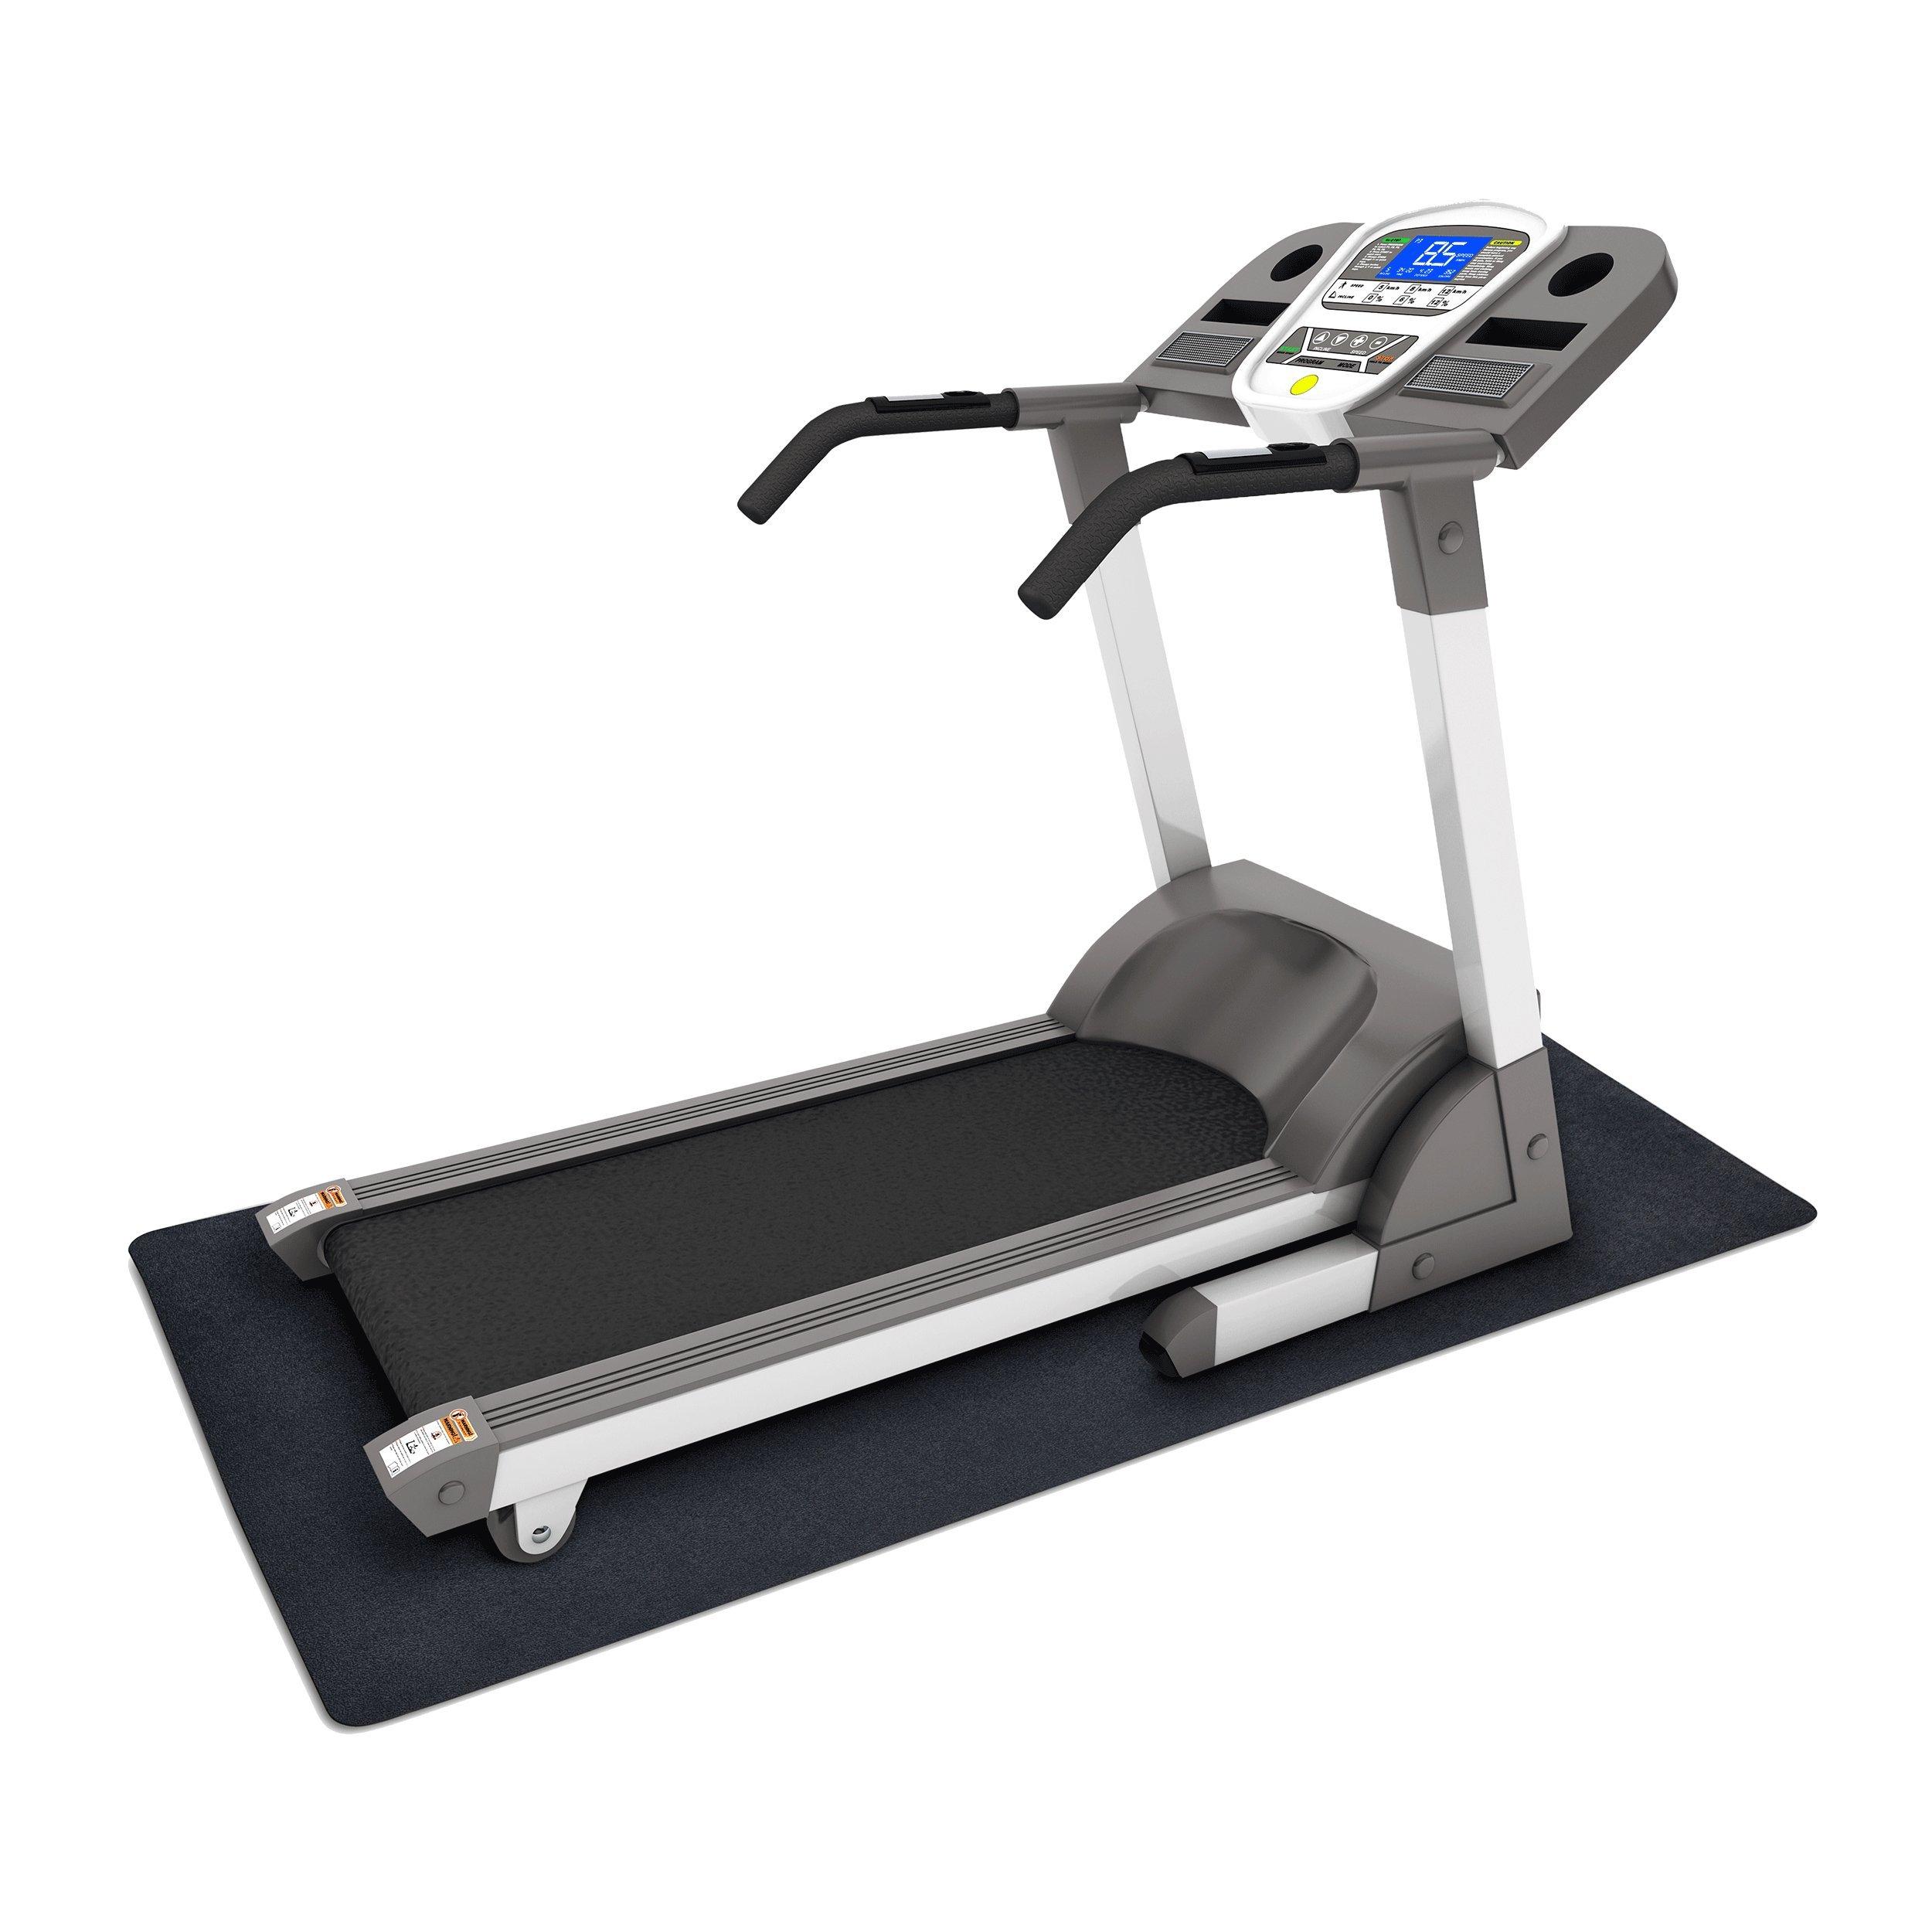 MotionTex 8M-110-36C-6 Fitness Equipment Mat, 36'' x 72'', Black by MotionTex